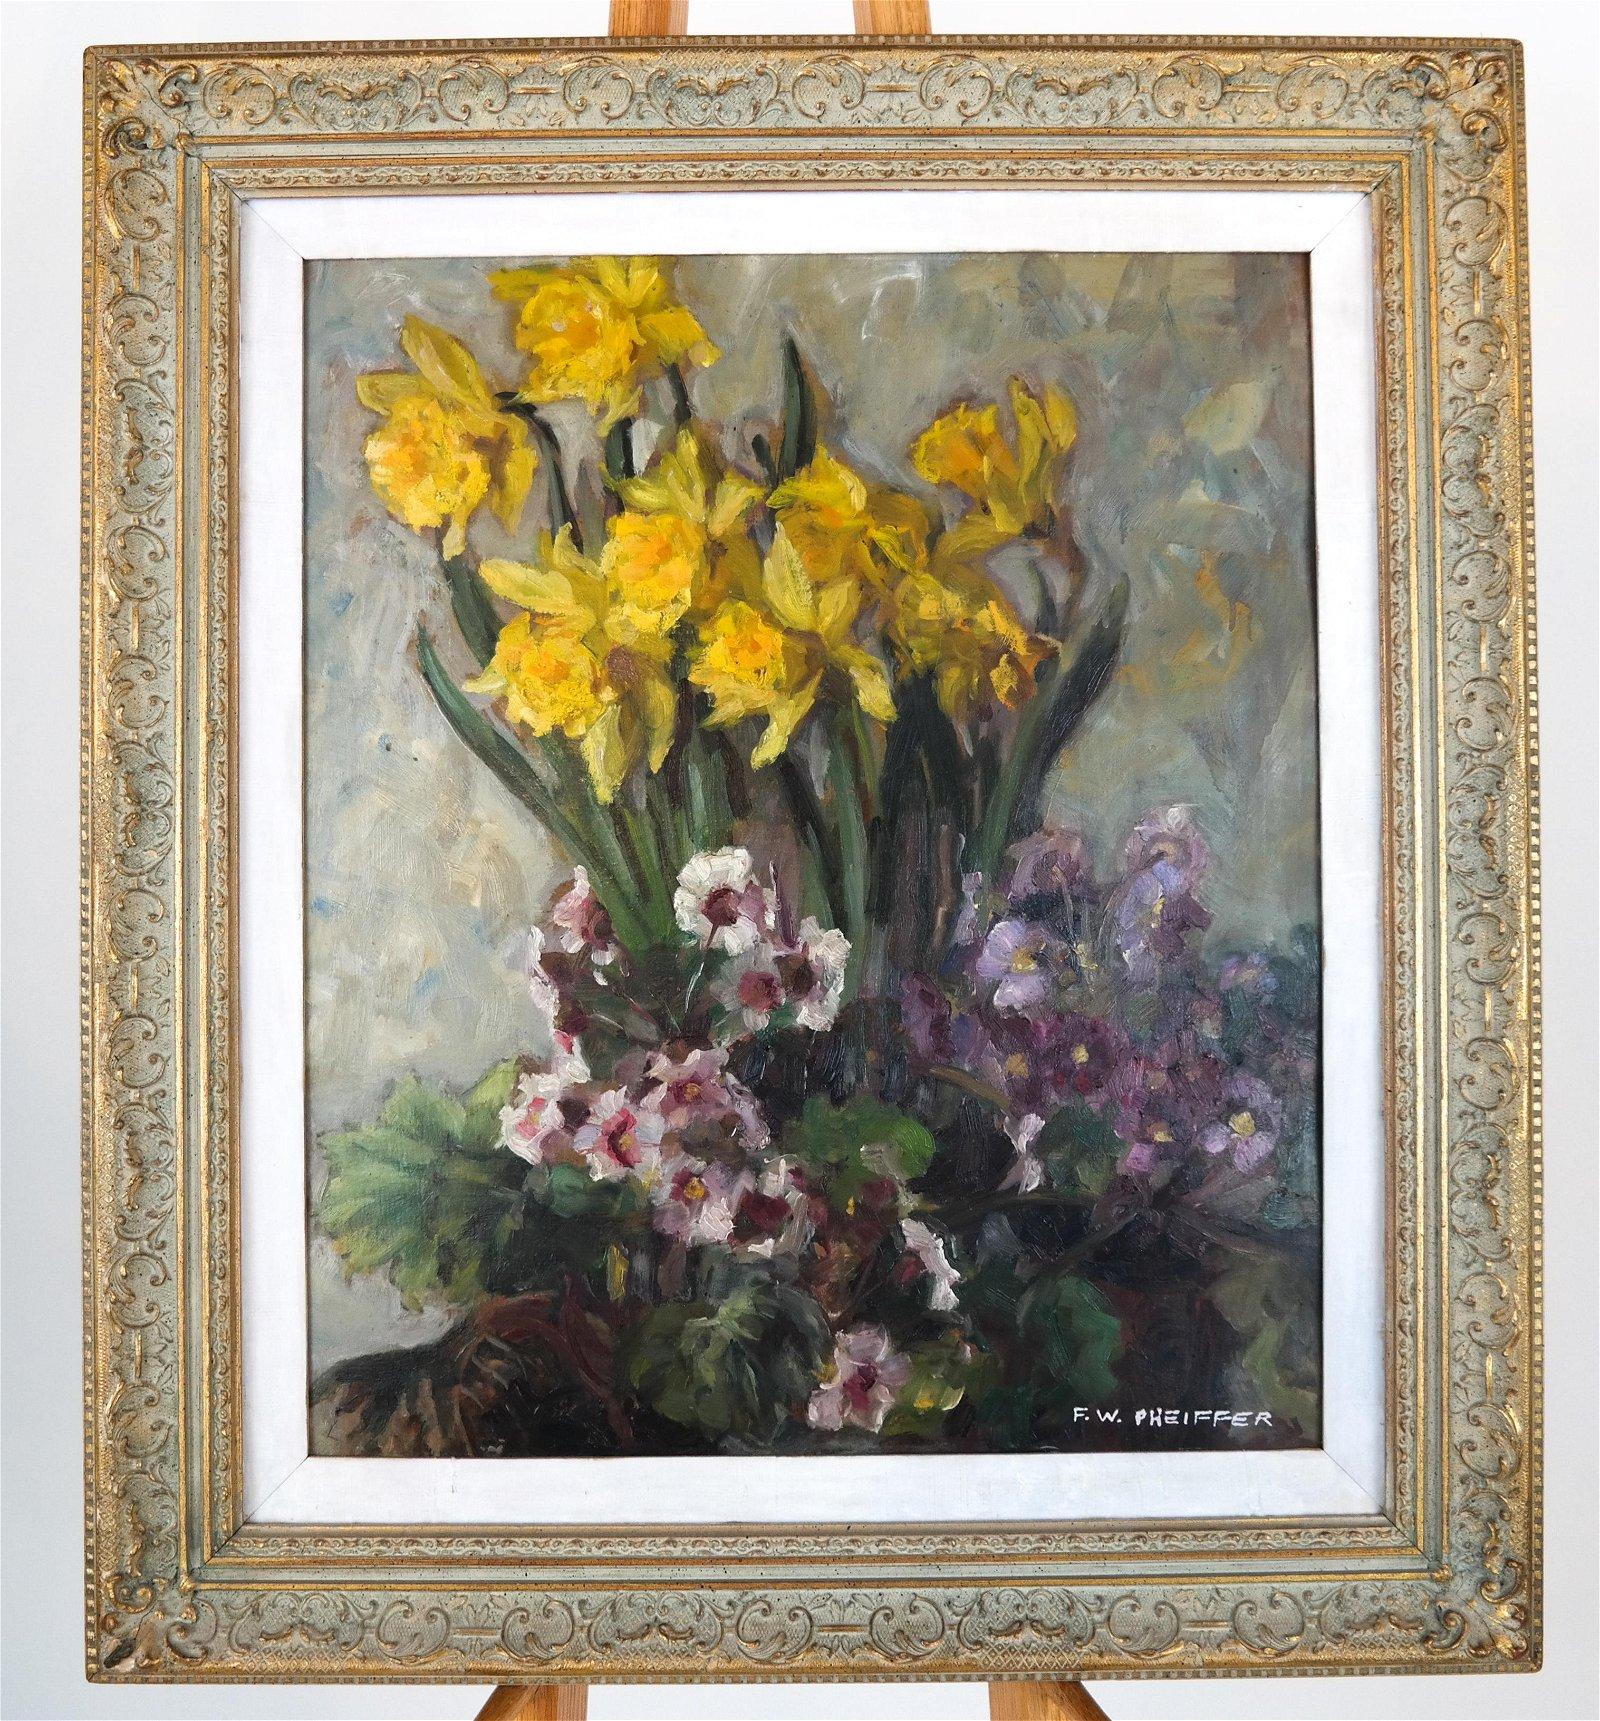 F.W. PHEIFFER: Still Life Painting